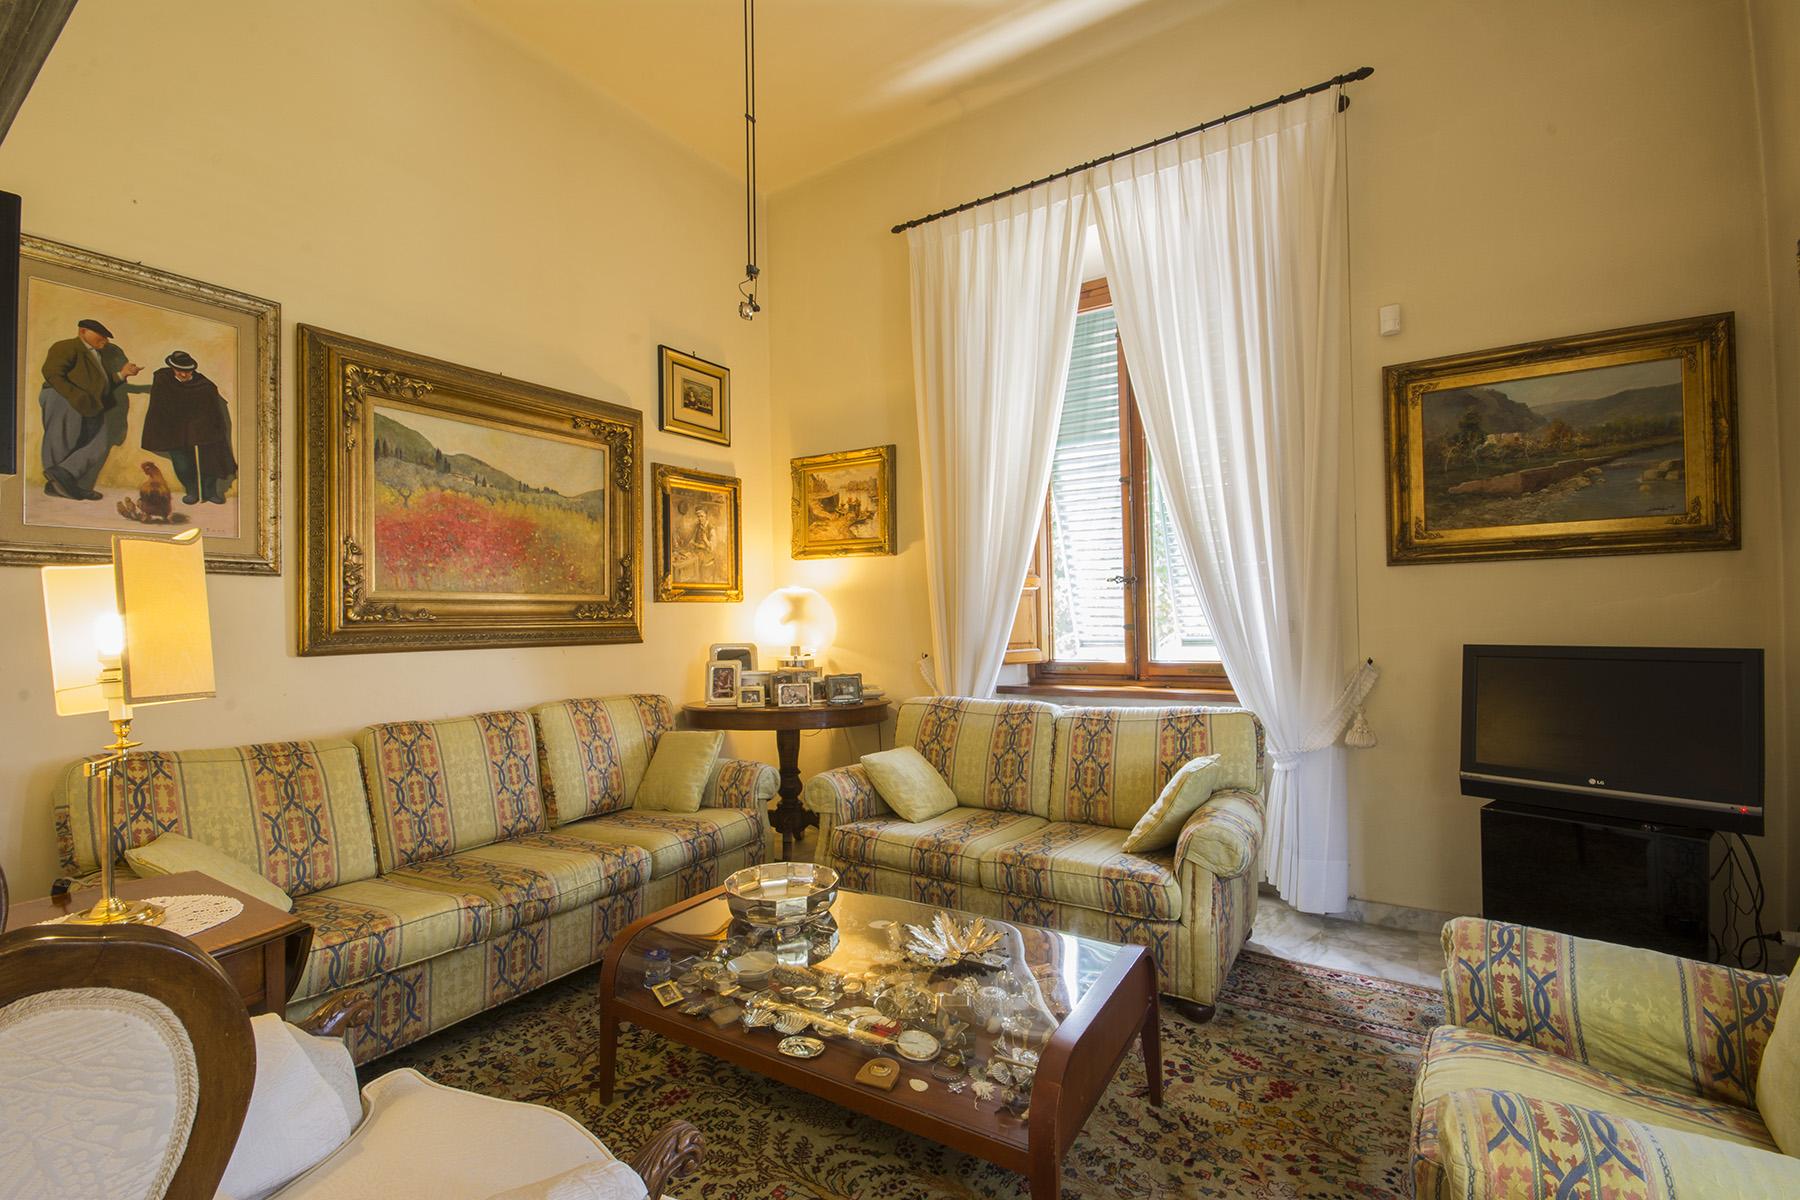 Villa in Vendita a Lucca: 5 locali, 500 mq - Foto 4